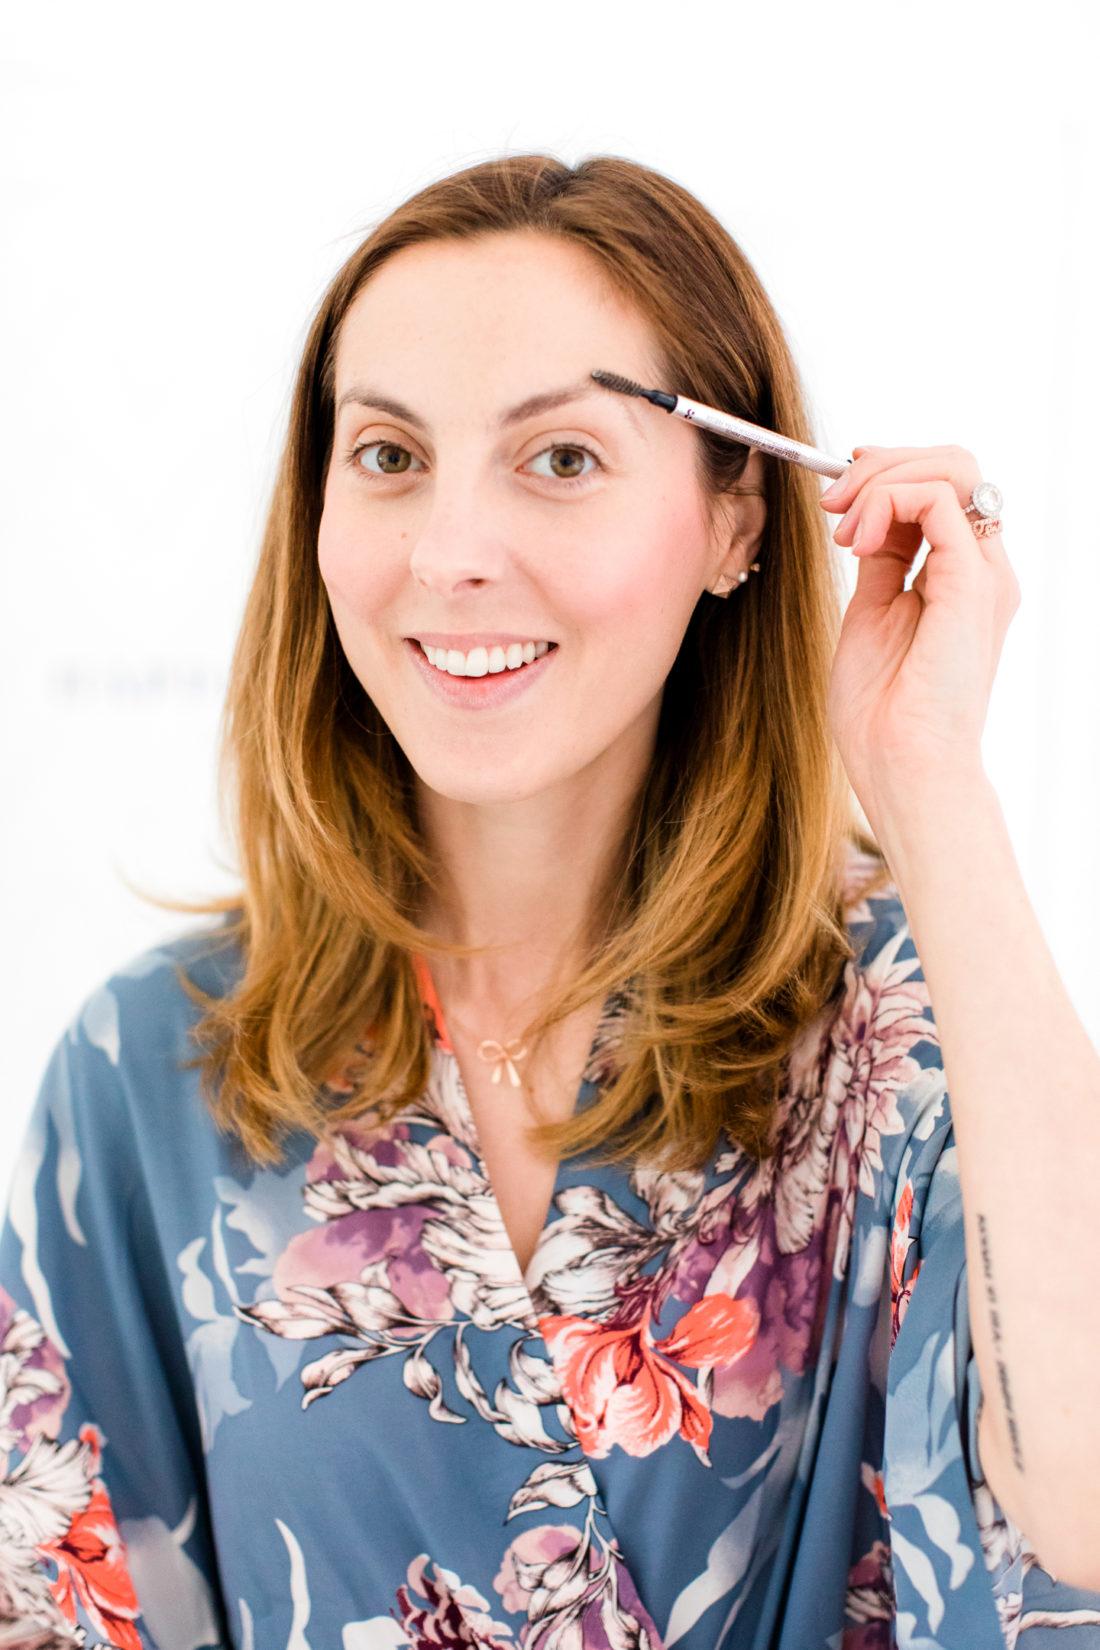 Eva Amurri Martino brushes her brows before applying brow pencil